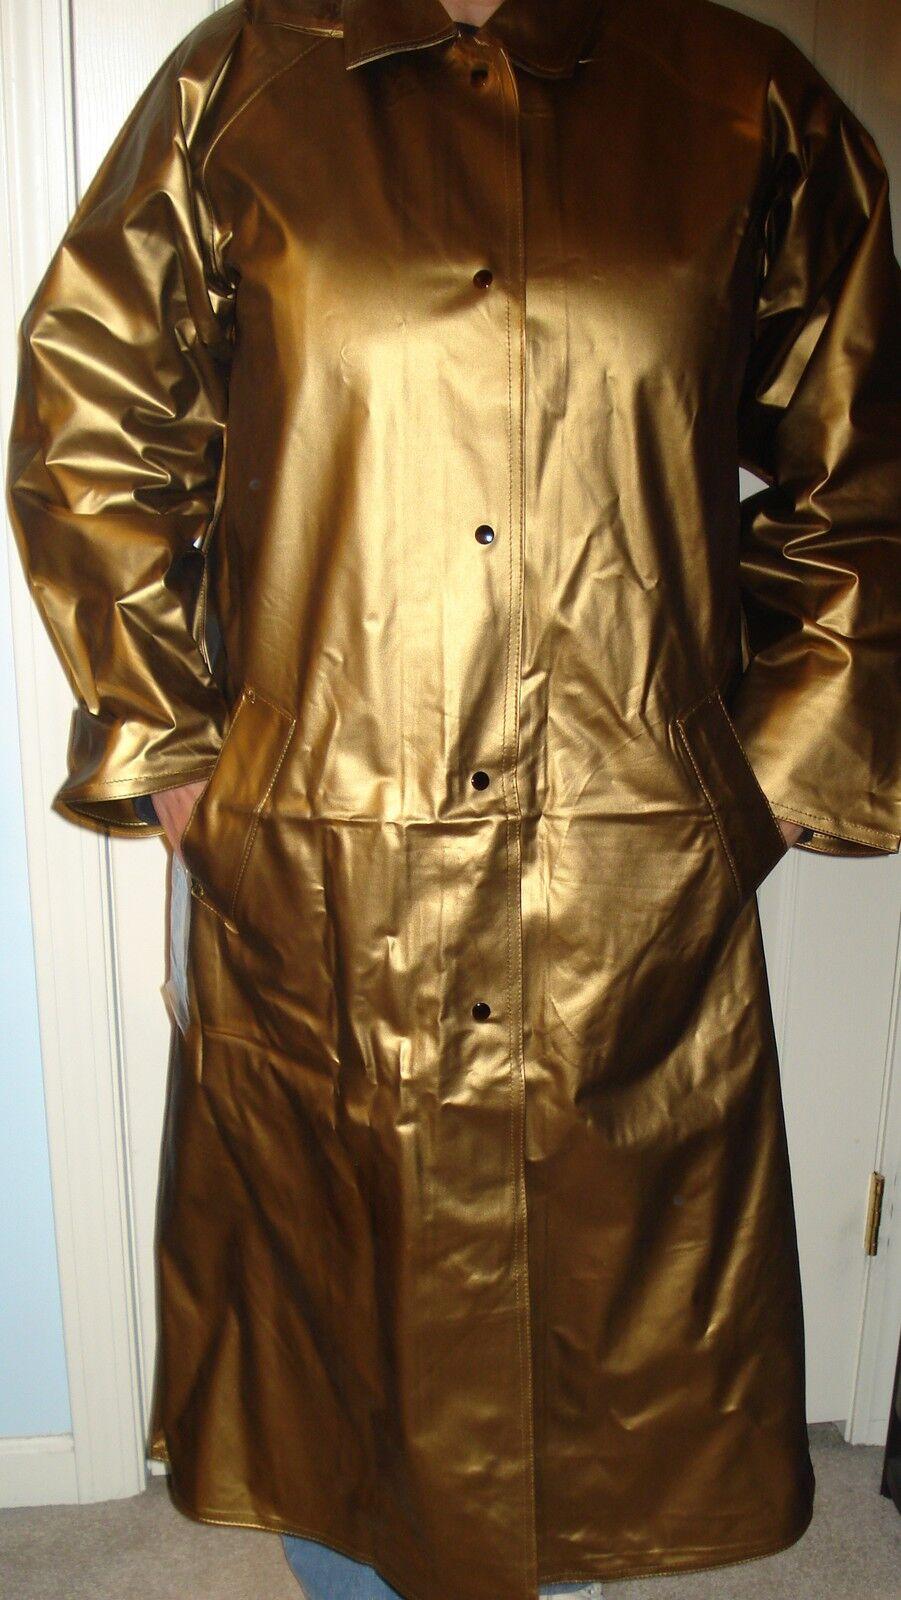 Nwt's Woman's 100% Heavy Vinyl Long Raincoat By Shedrain Corporation Size M